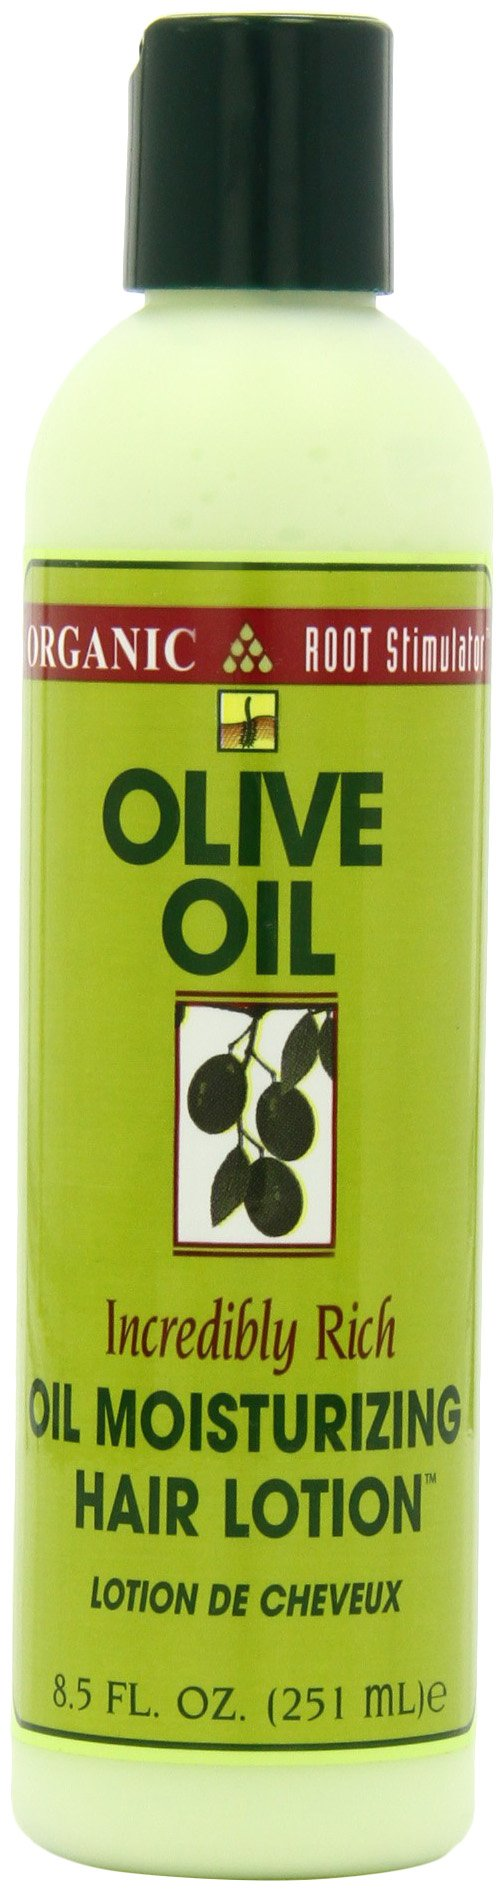 Organic Root Stimulator Olive Oil Moisturizing Hair Lotion, 8.5 Ounce